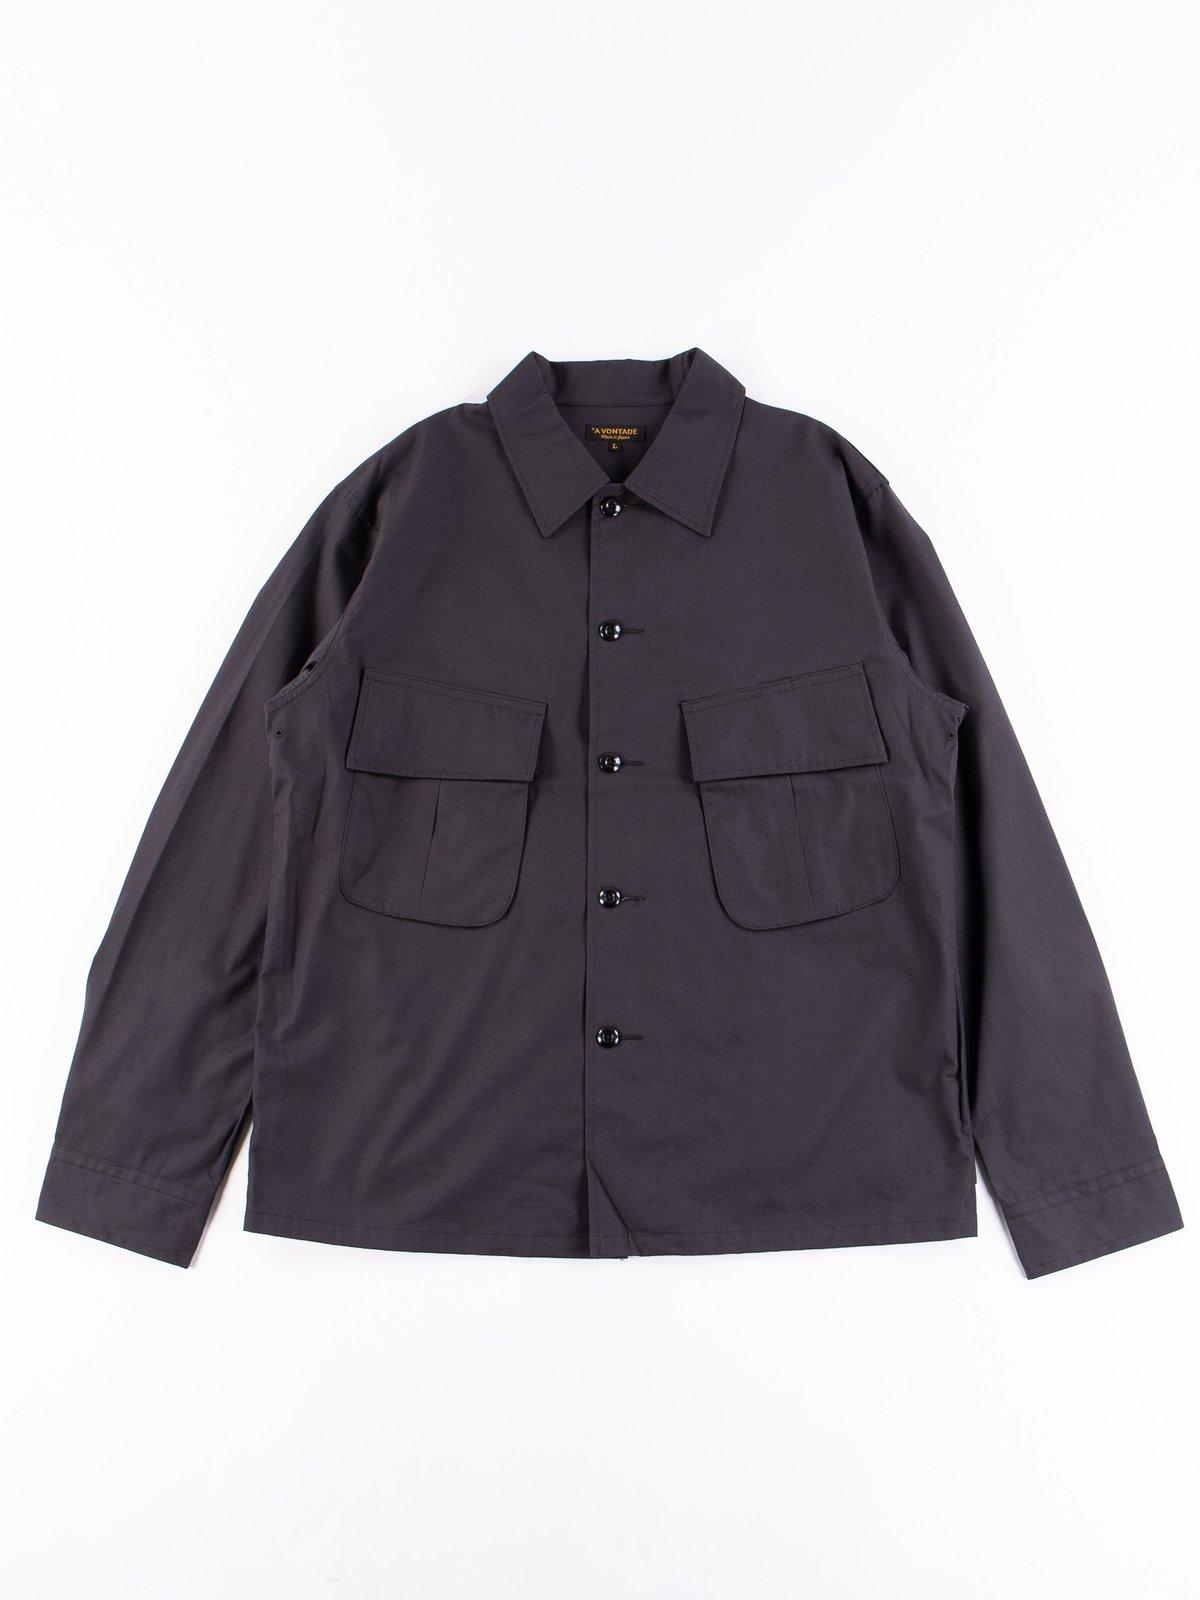 Fade Black Selvedge Poplin Cotton Combat Short Jacket - Image 1